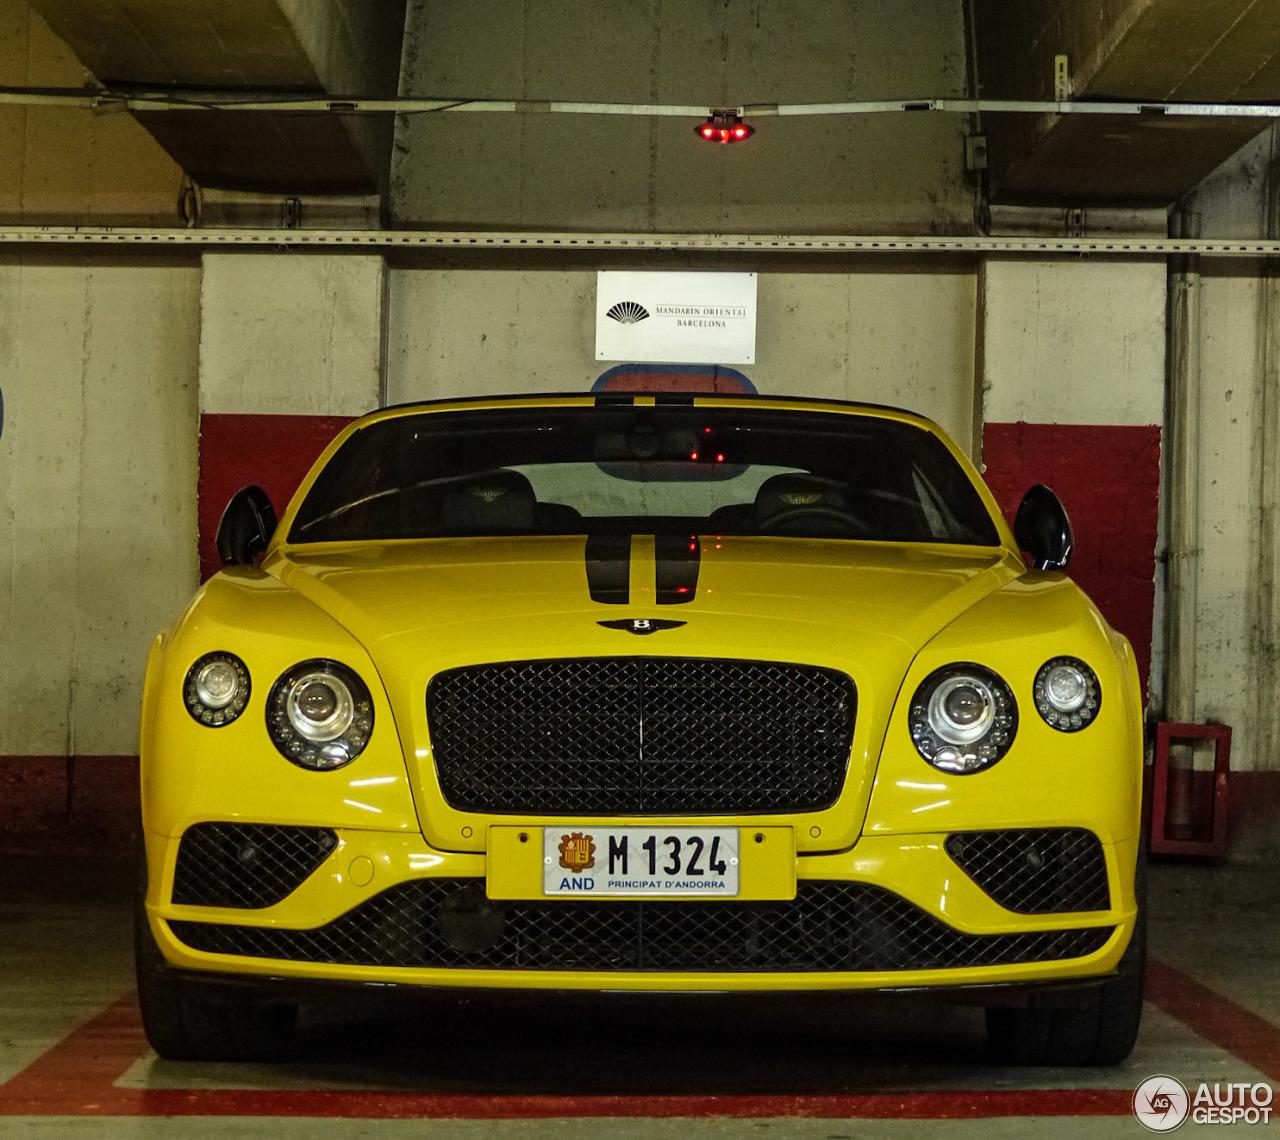 Bentley Gtc For Sale: Bentley Continental GTC V8 S 2016